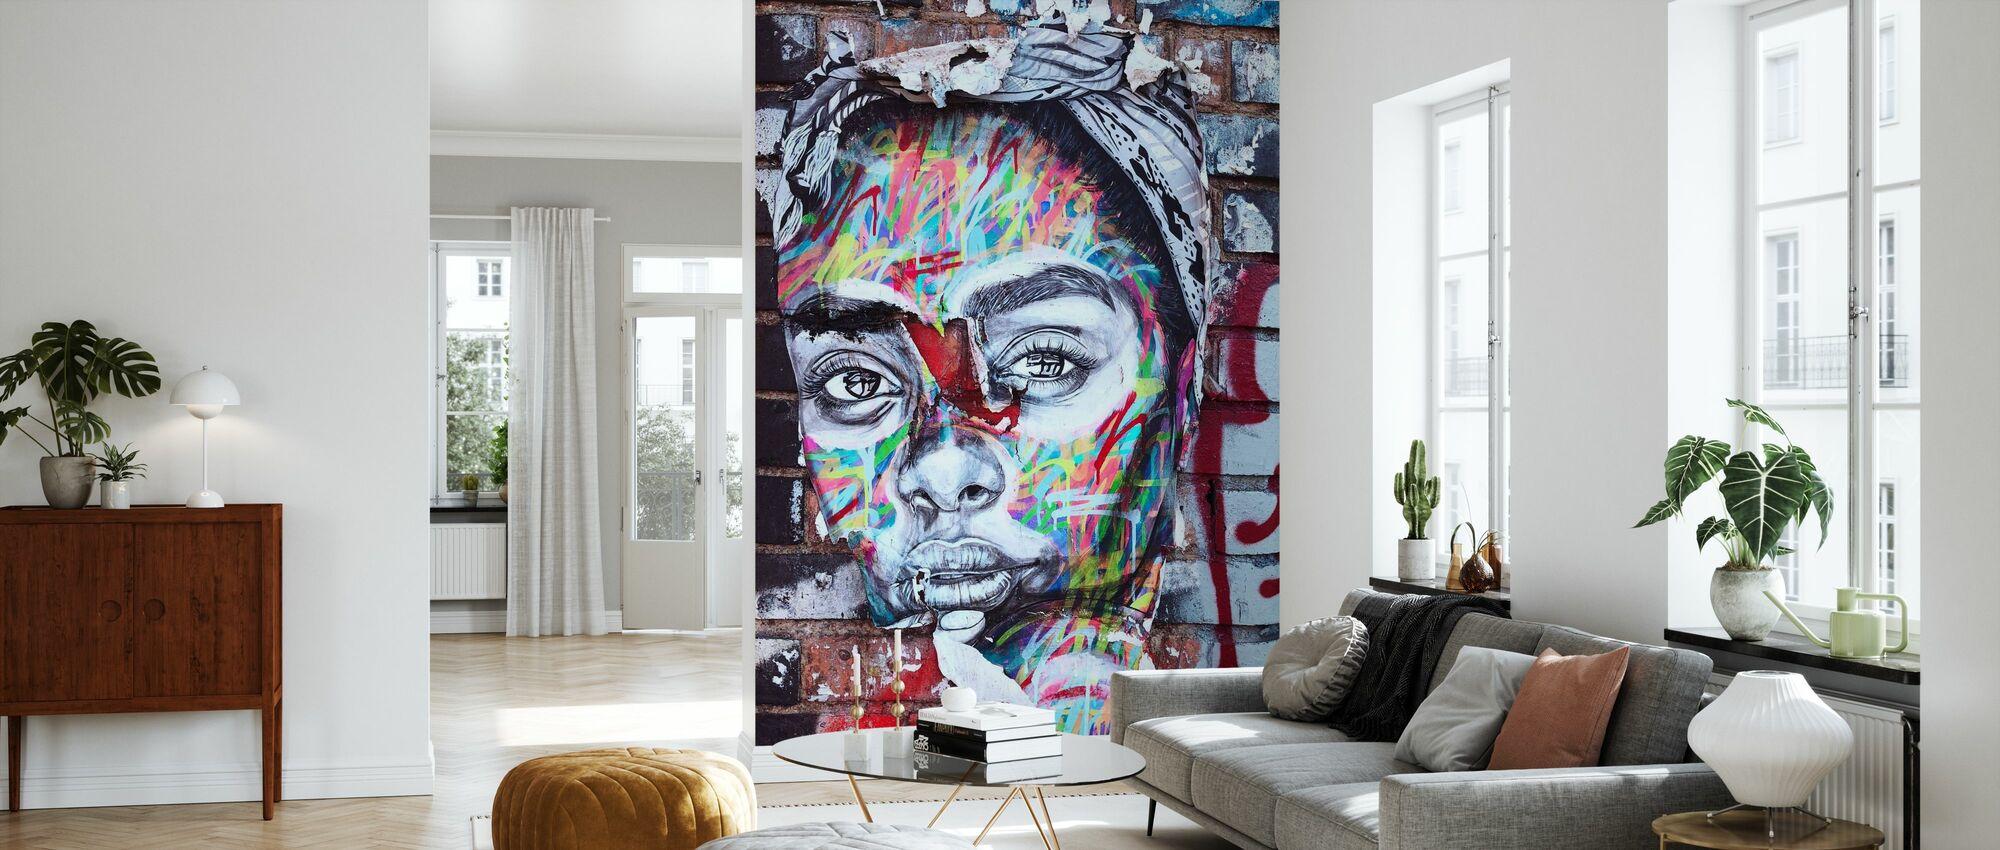 Street Art Portrait - Wallpaper - Living Room